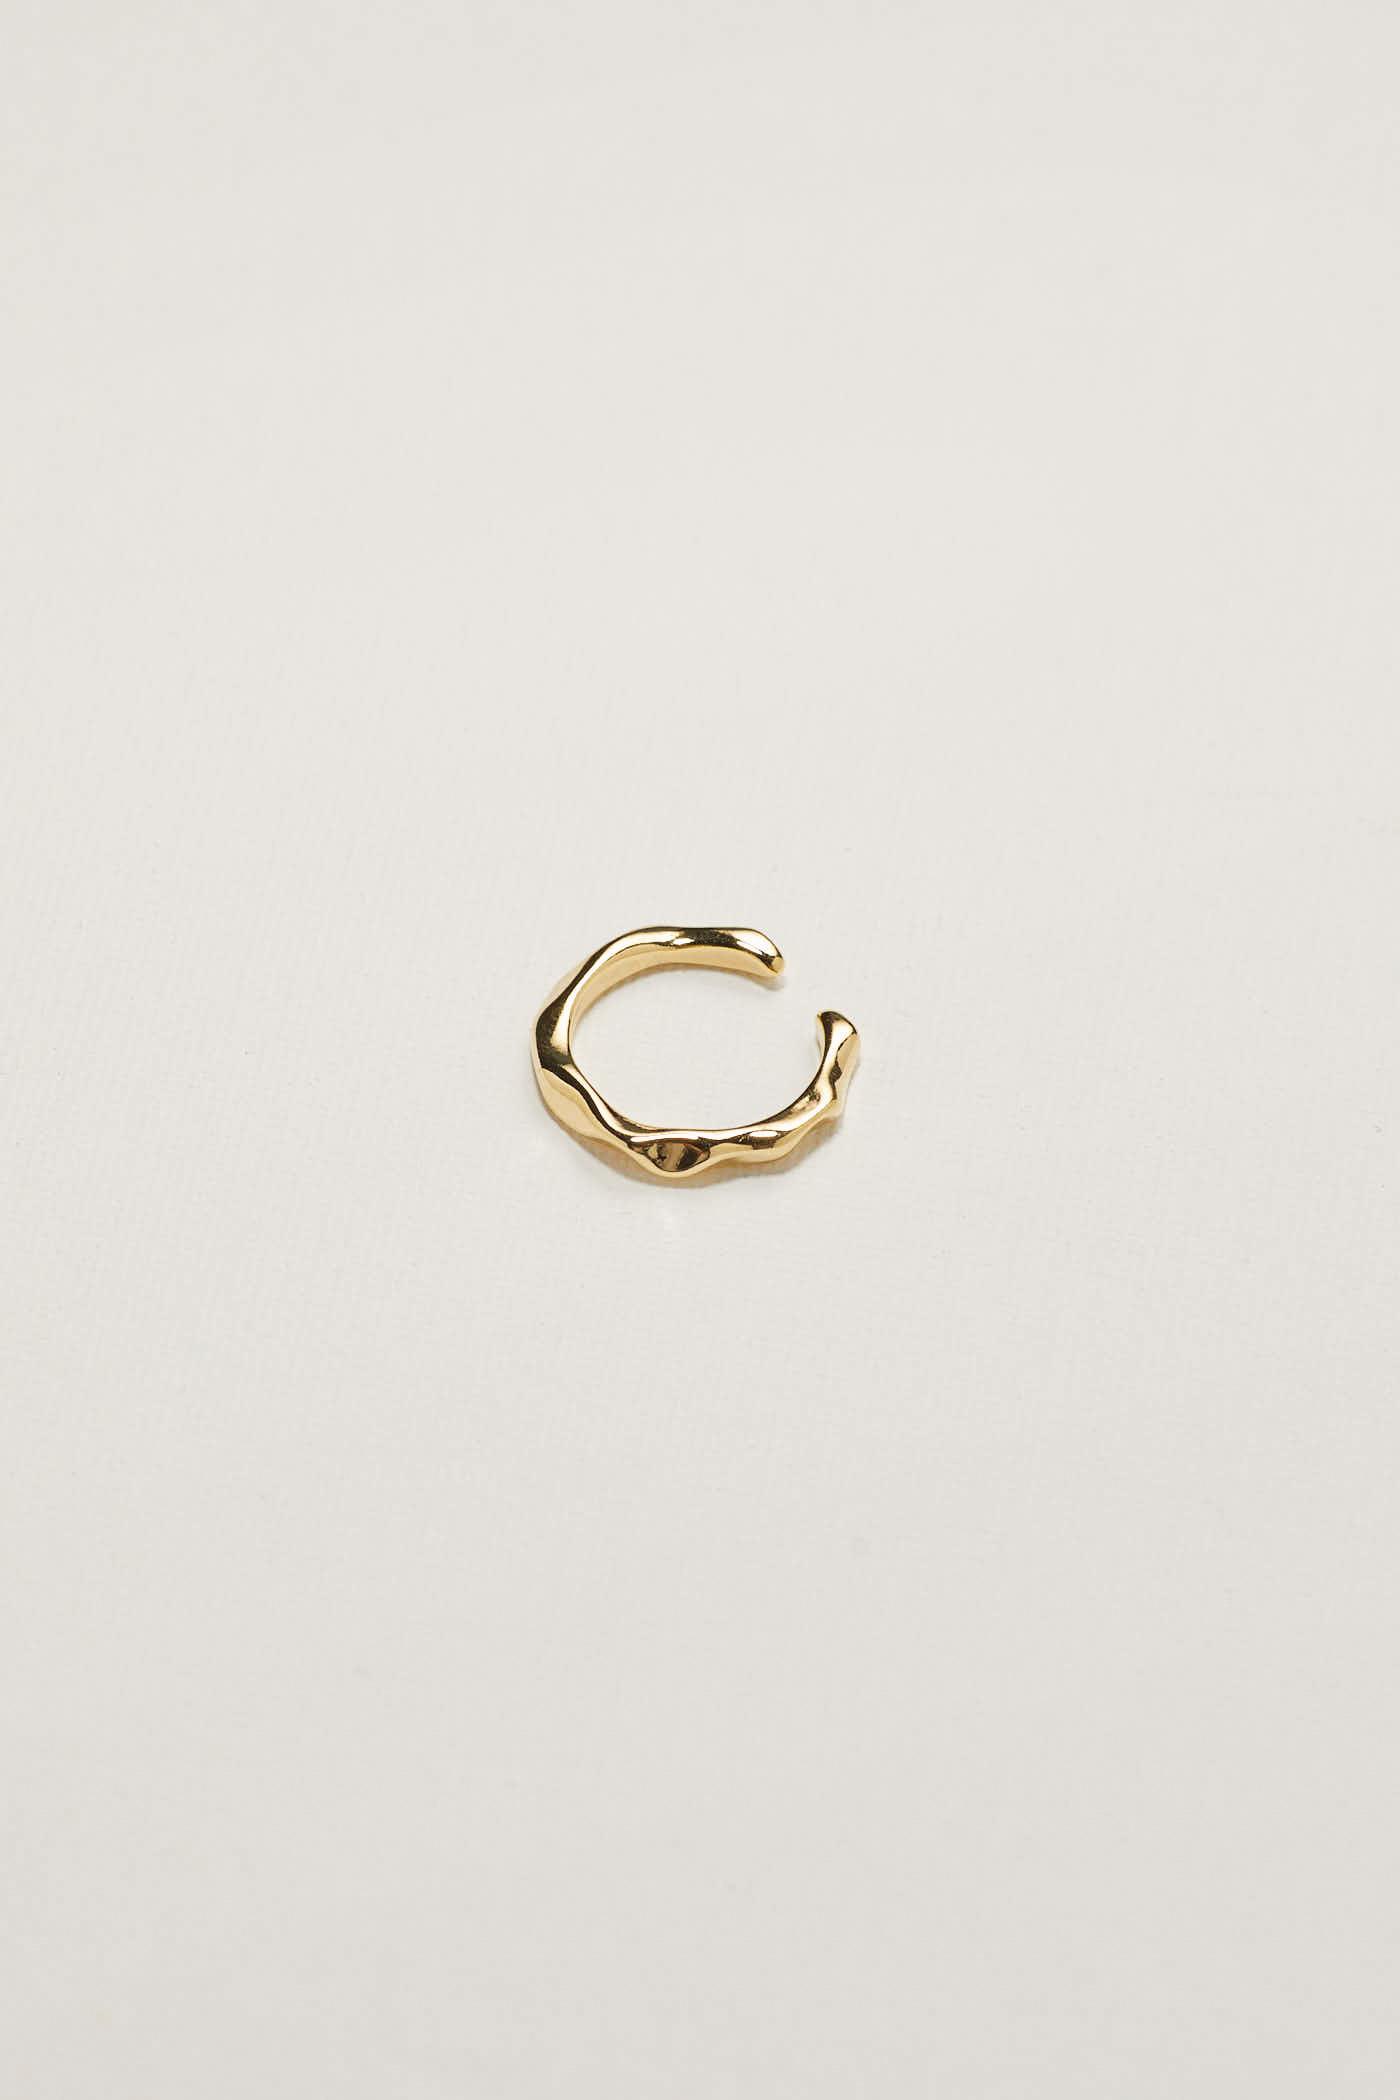 Ariele Ring